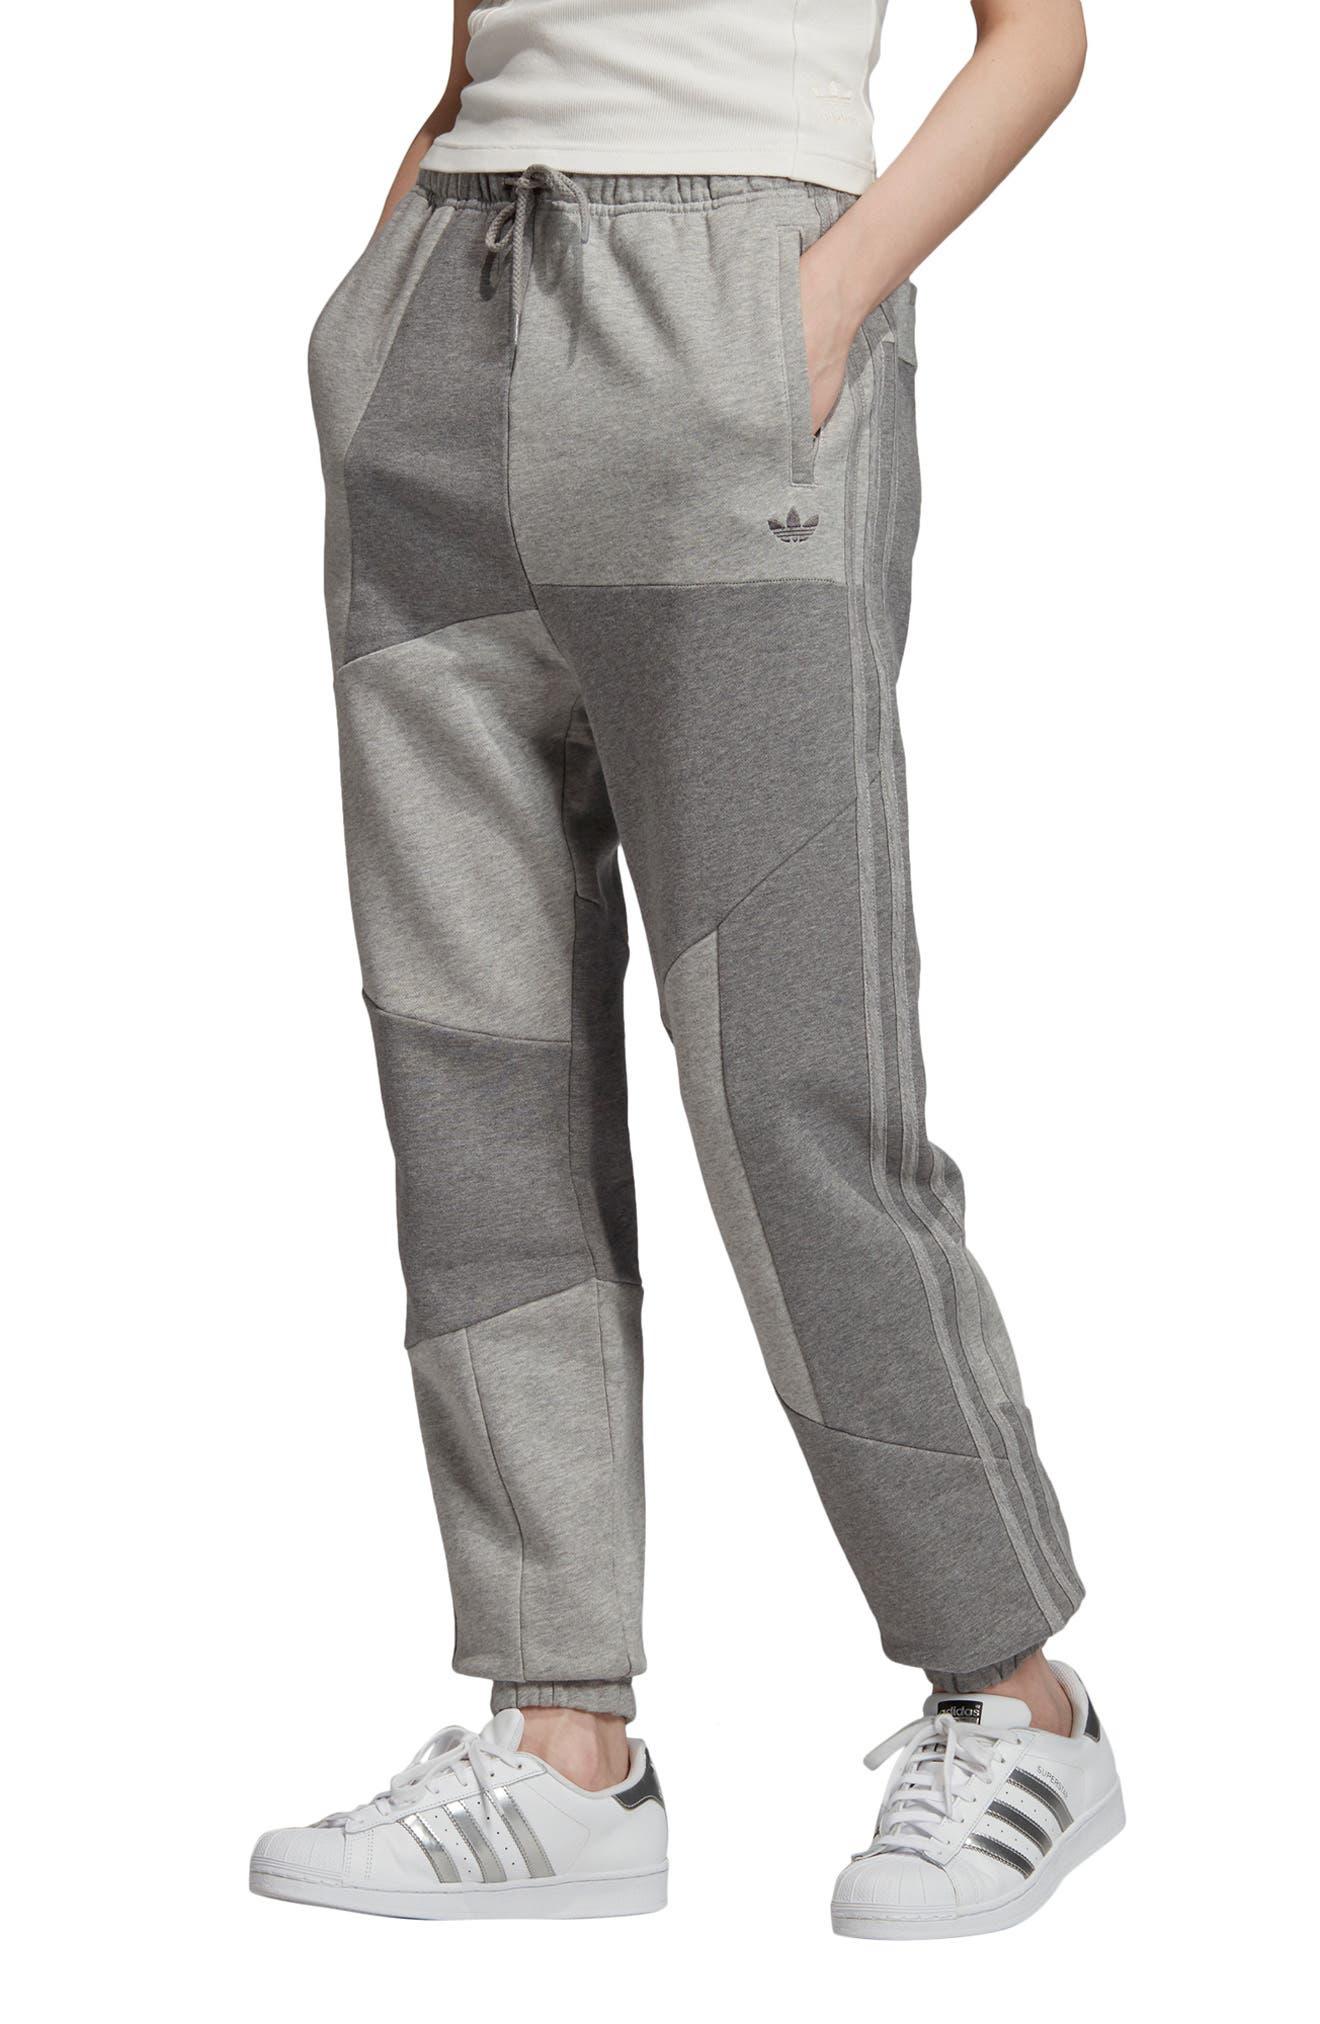 Women's Adidas Originals Danielle Cathari Sweatpants